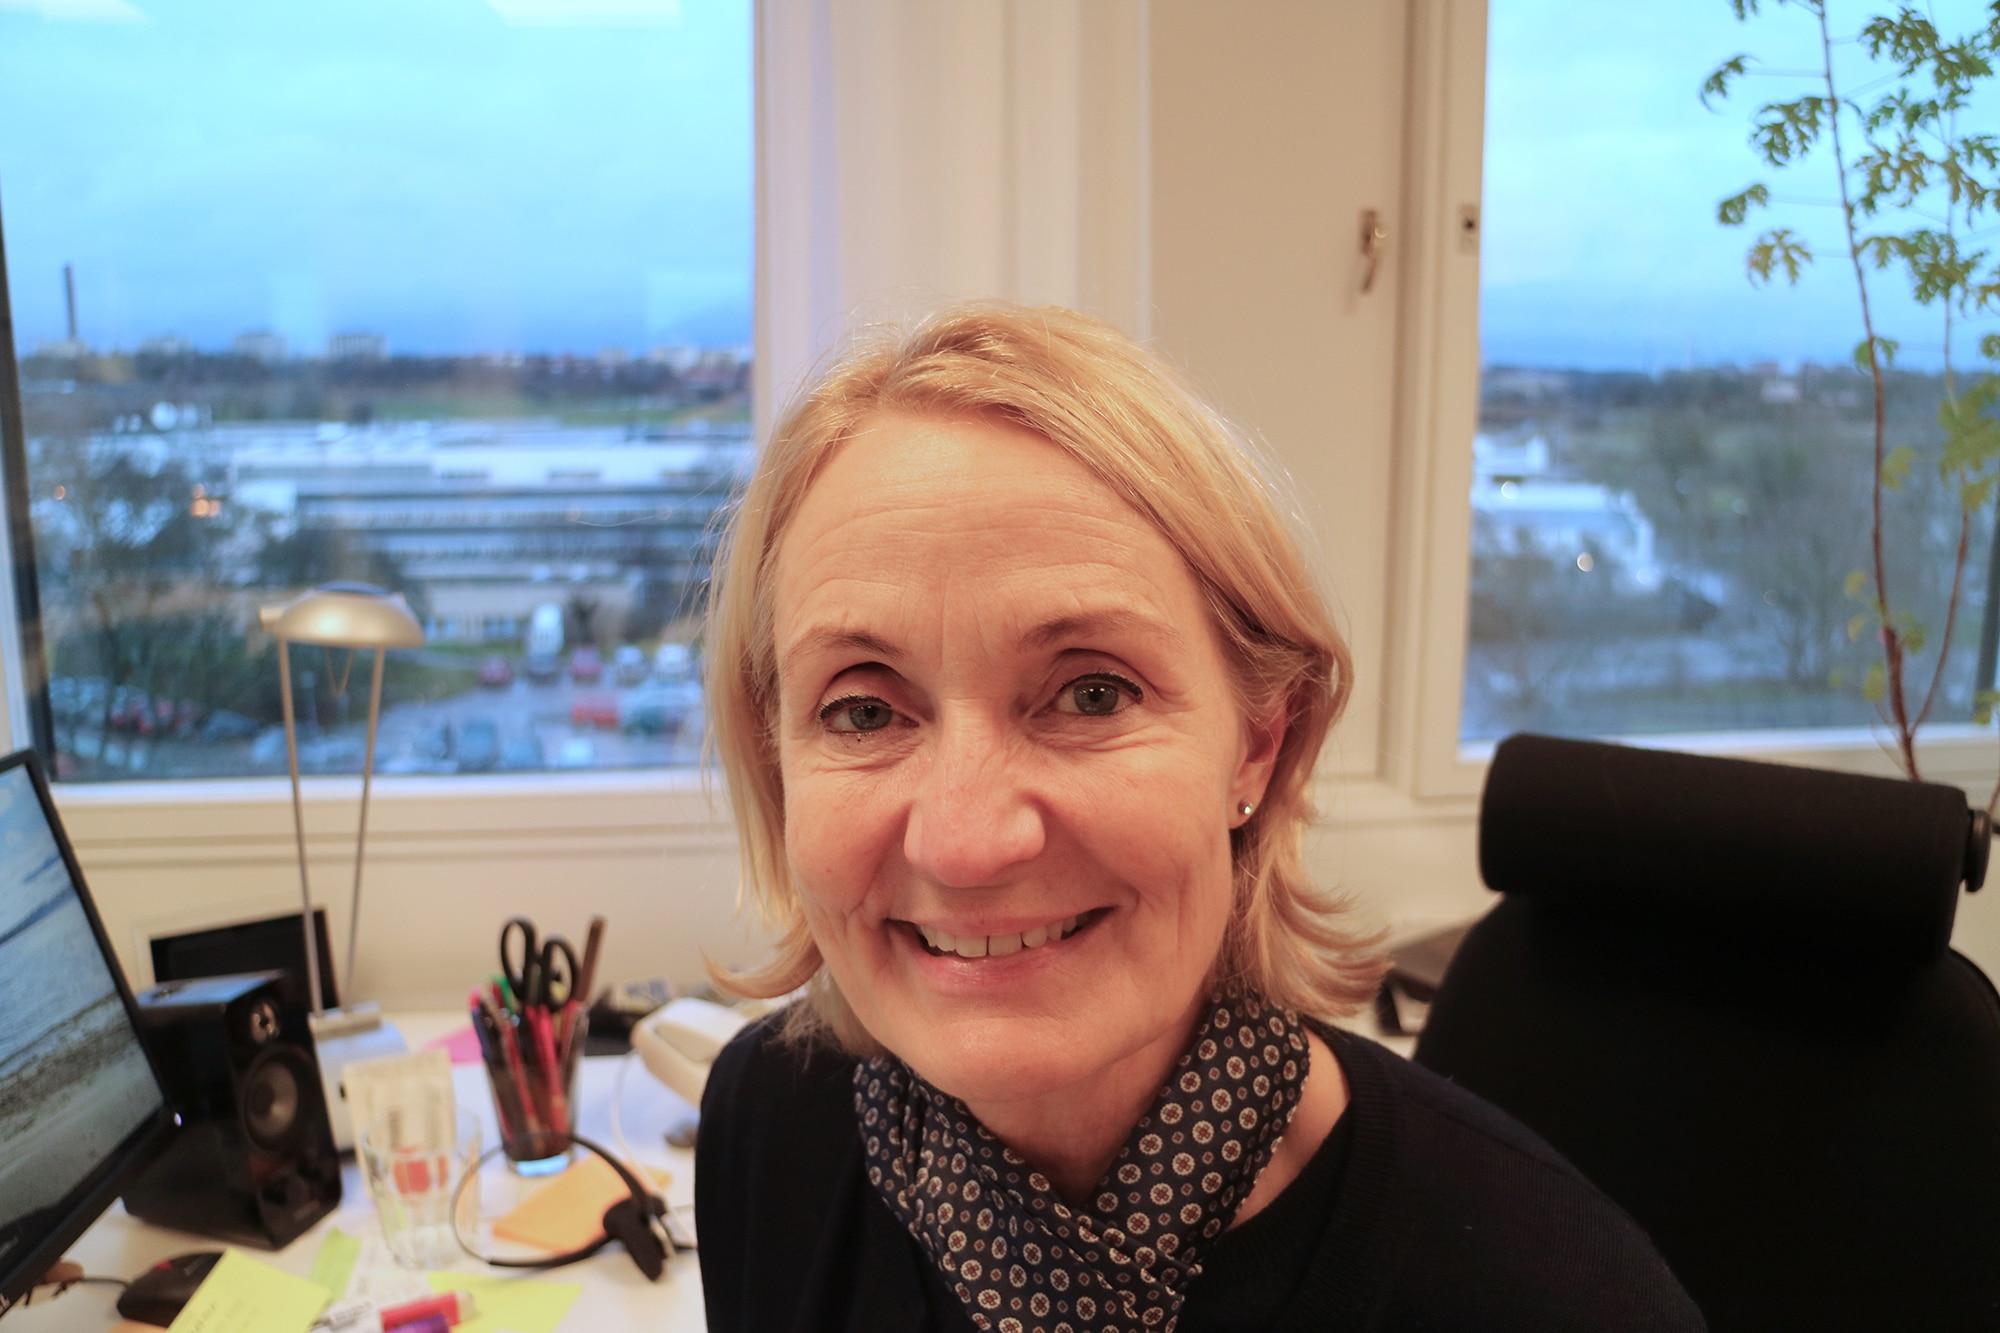 Stora journalistpriset – Bibi Rödöö om sommar i p1